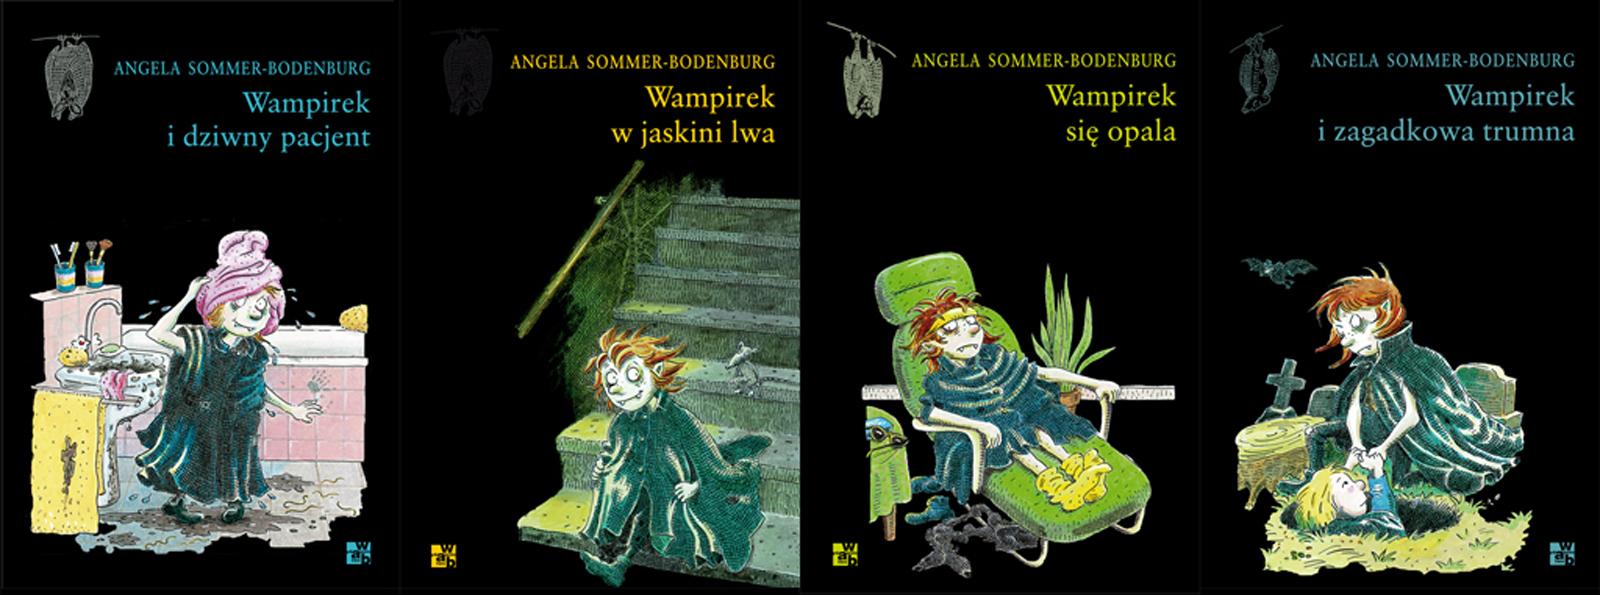 wampirki-9-12